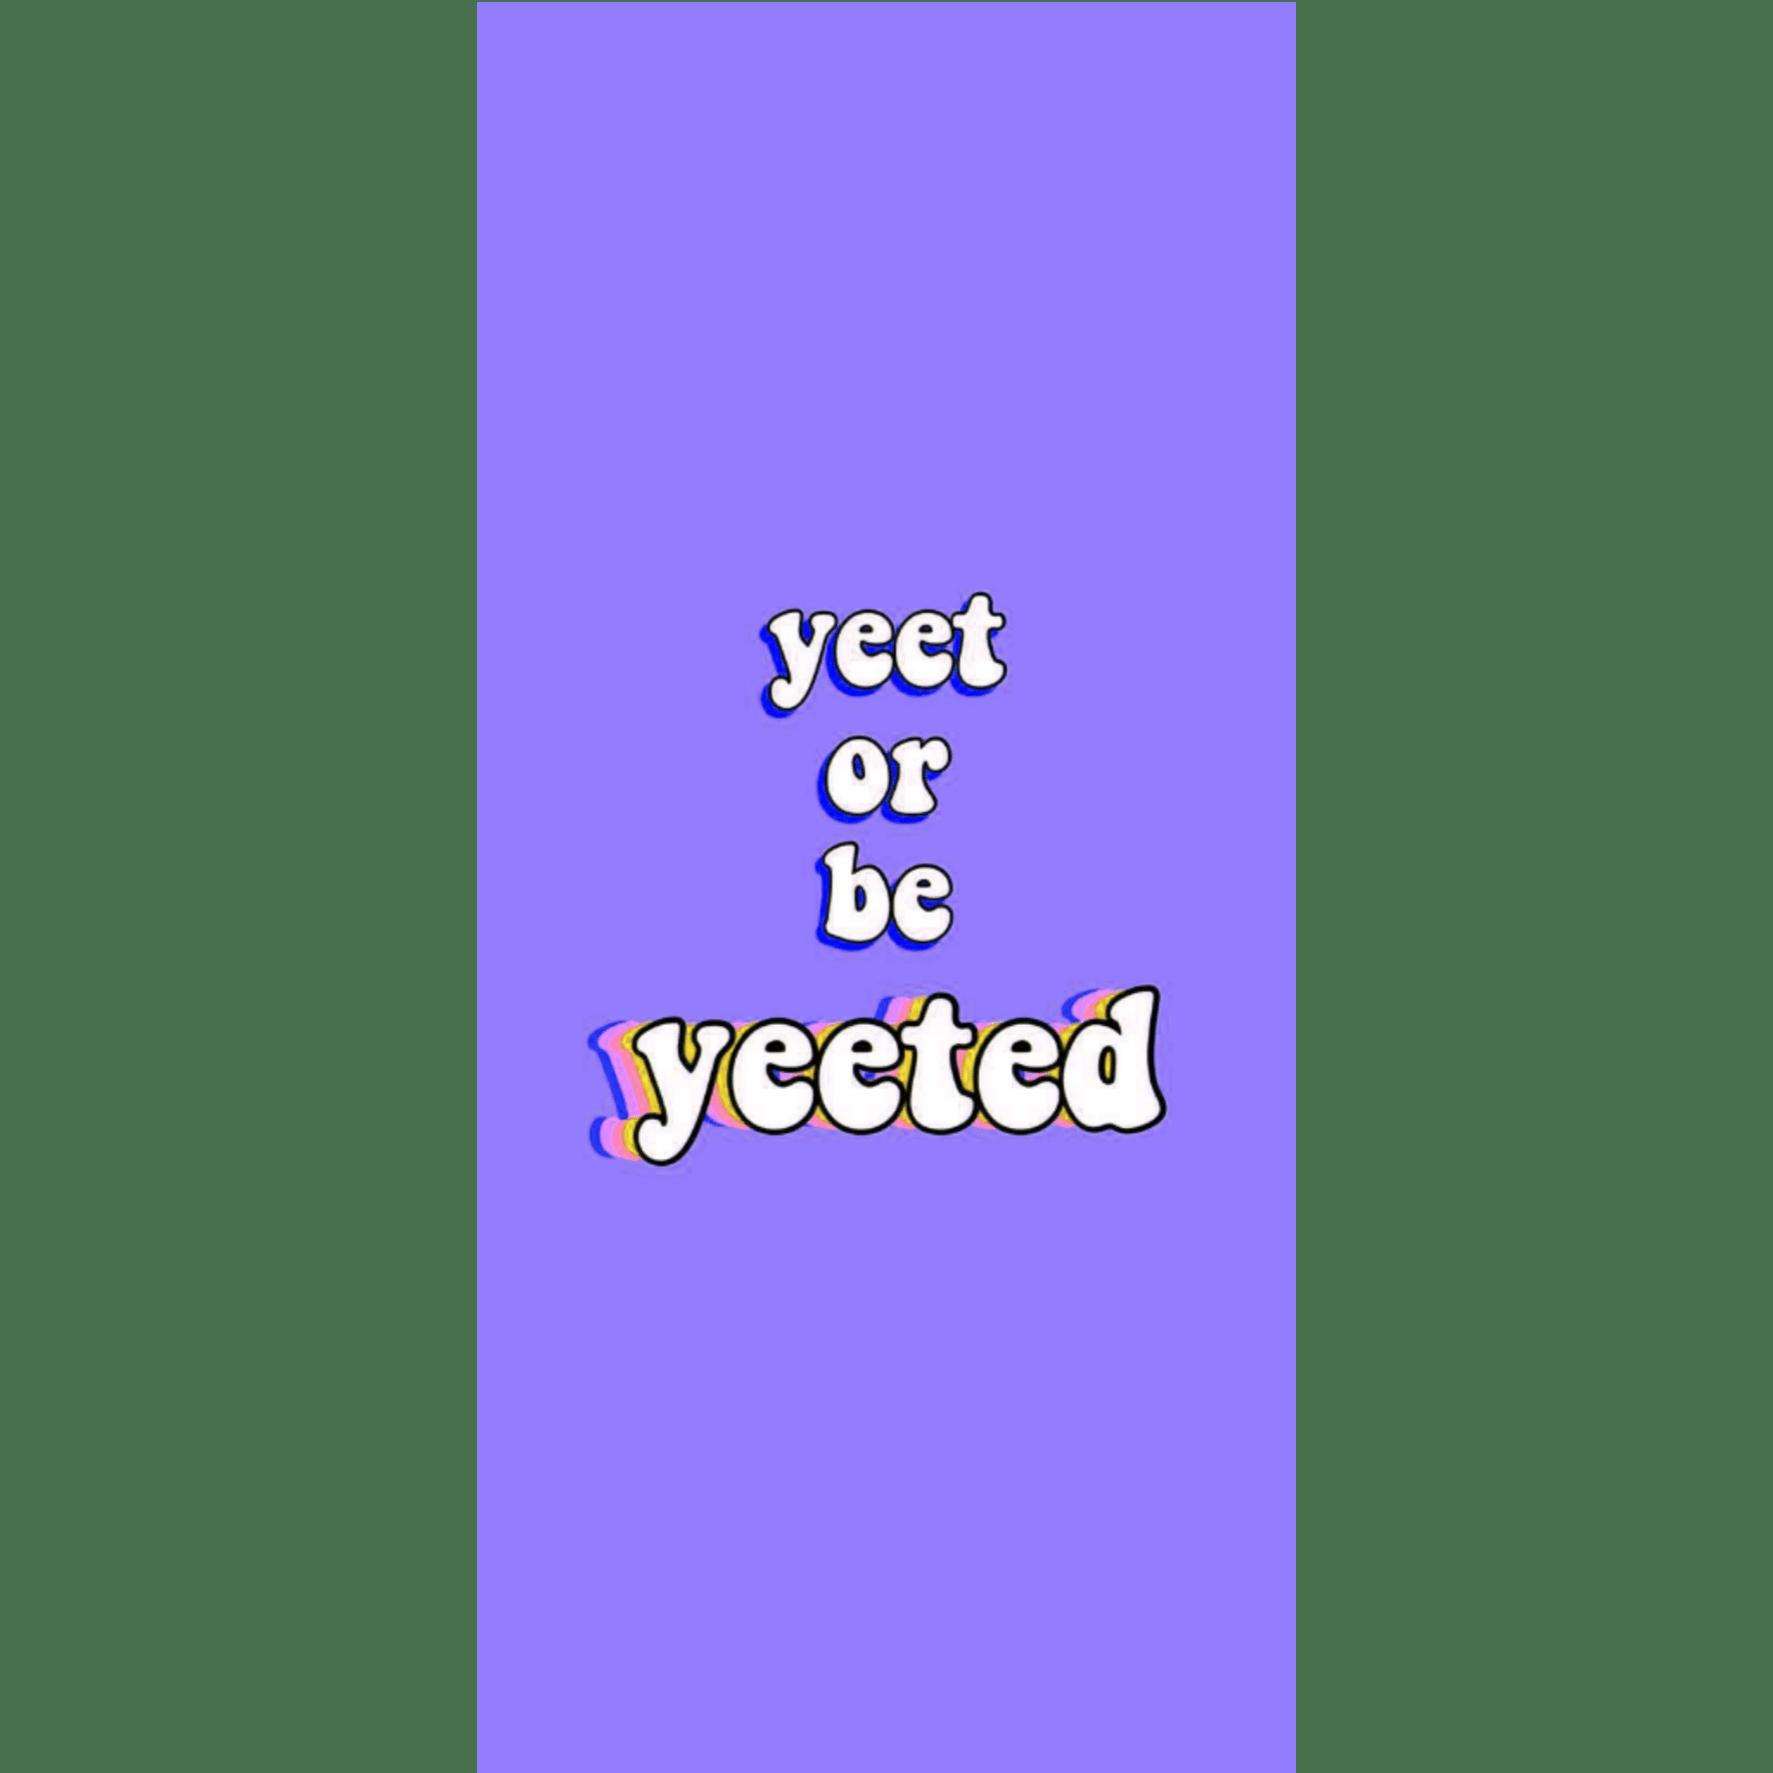 Yeet Or Be Yeeted Wallpapers Top Free Yeet Or Be Yeeted